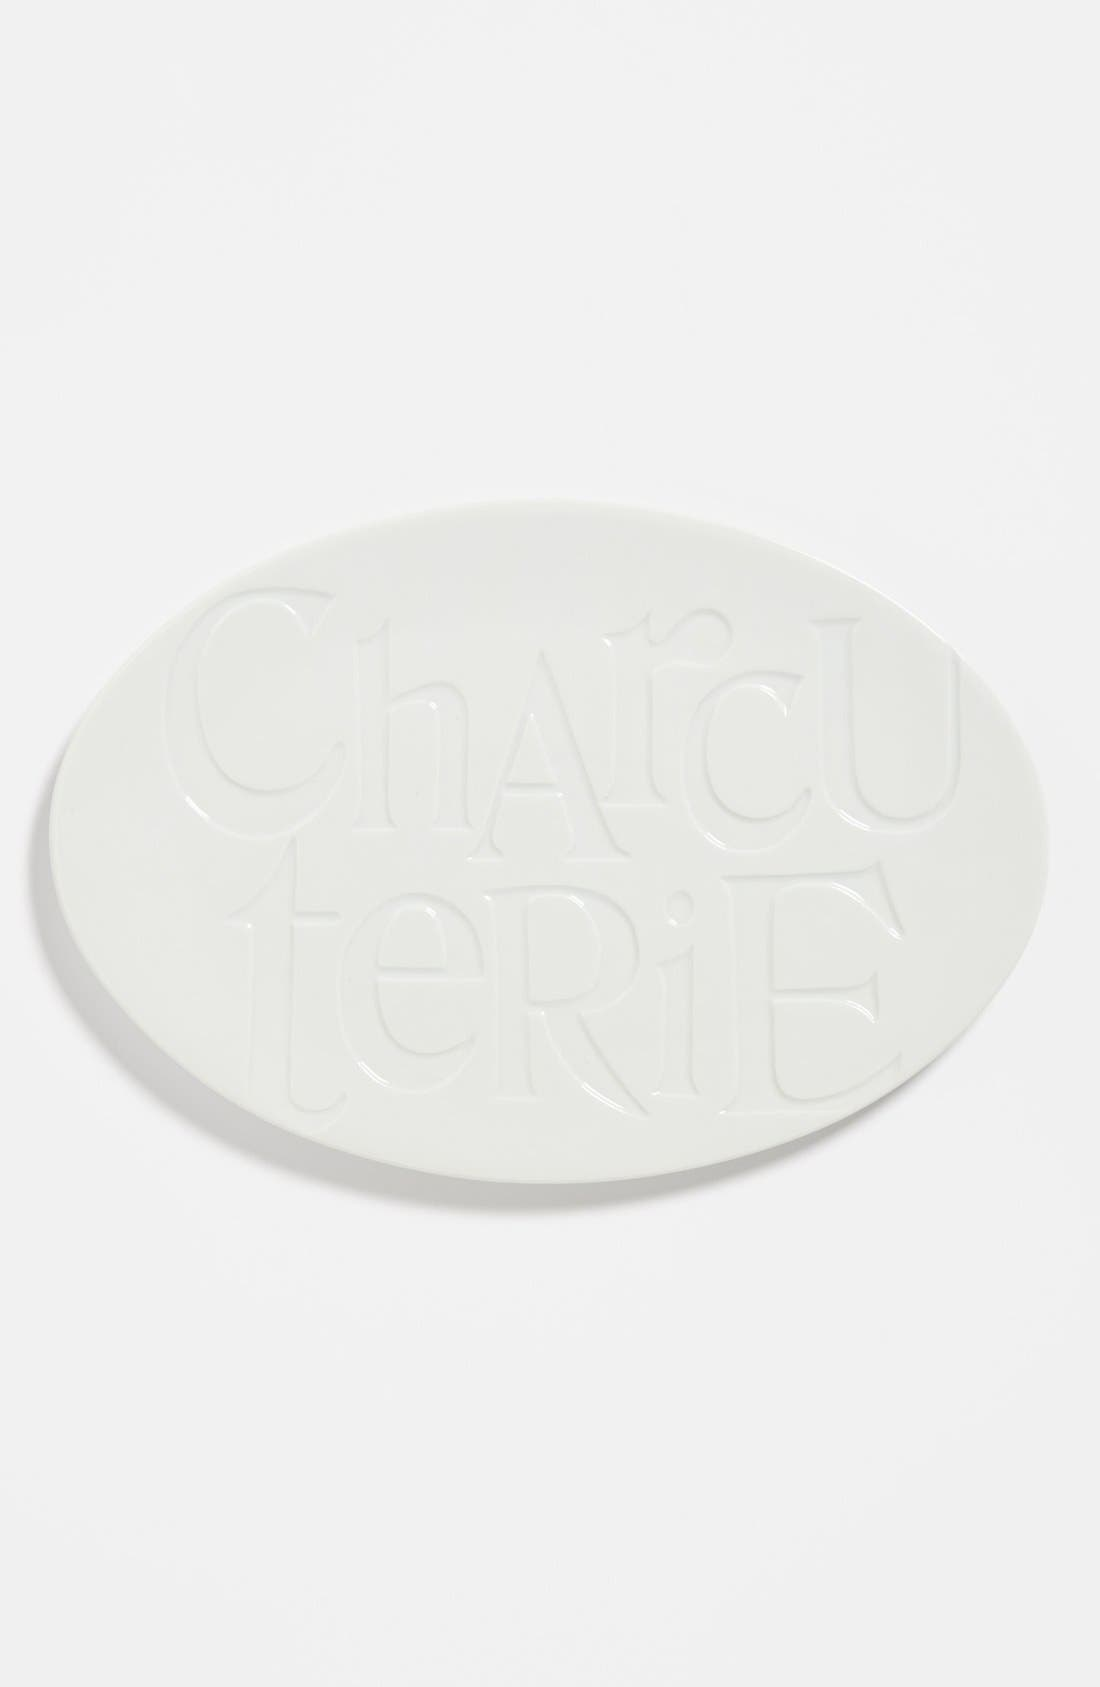 Alternate Image 1 Selected - Rosanna 'Savour - Charcuterie' Porcelain Tray